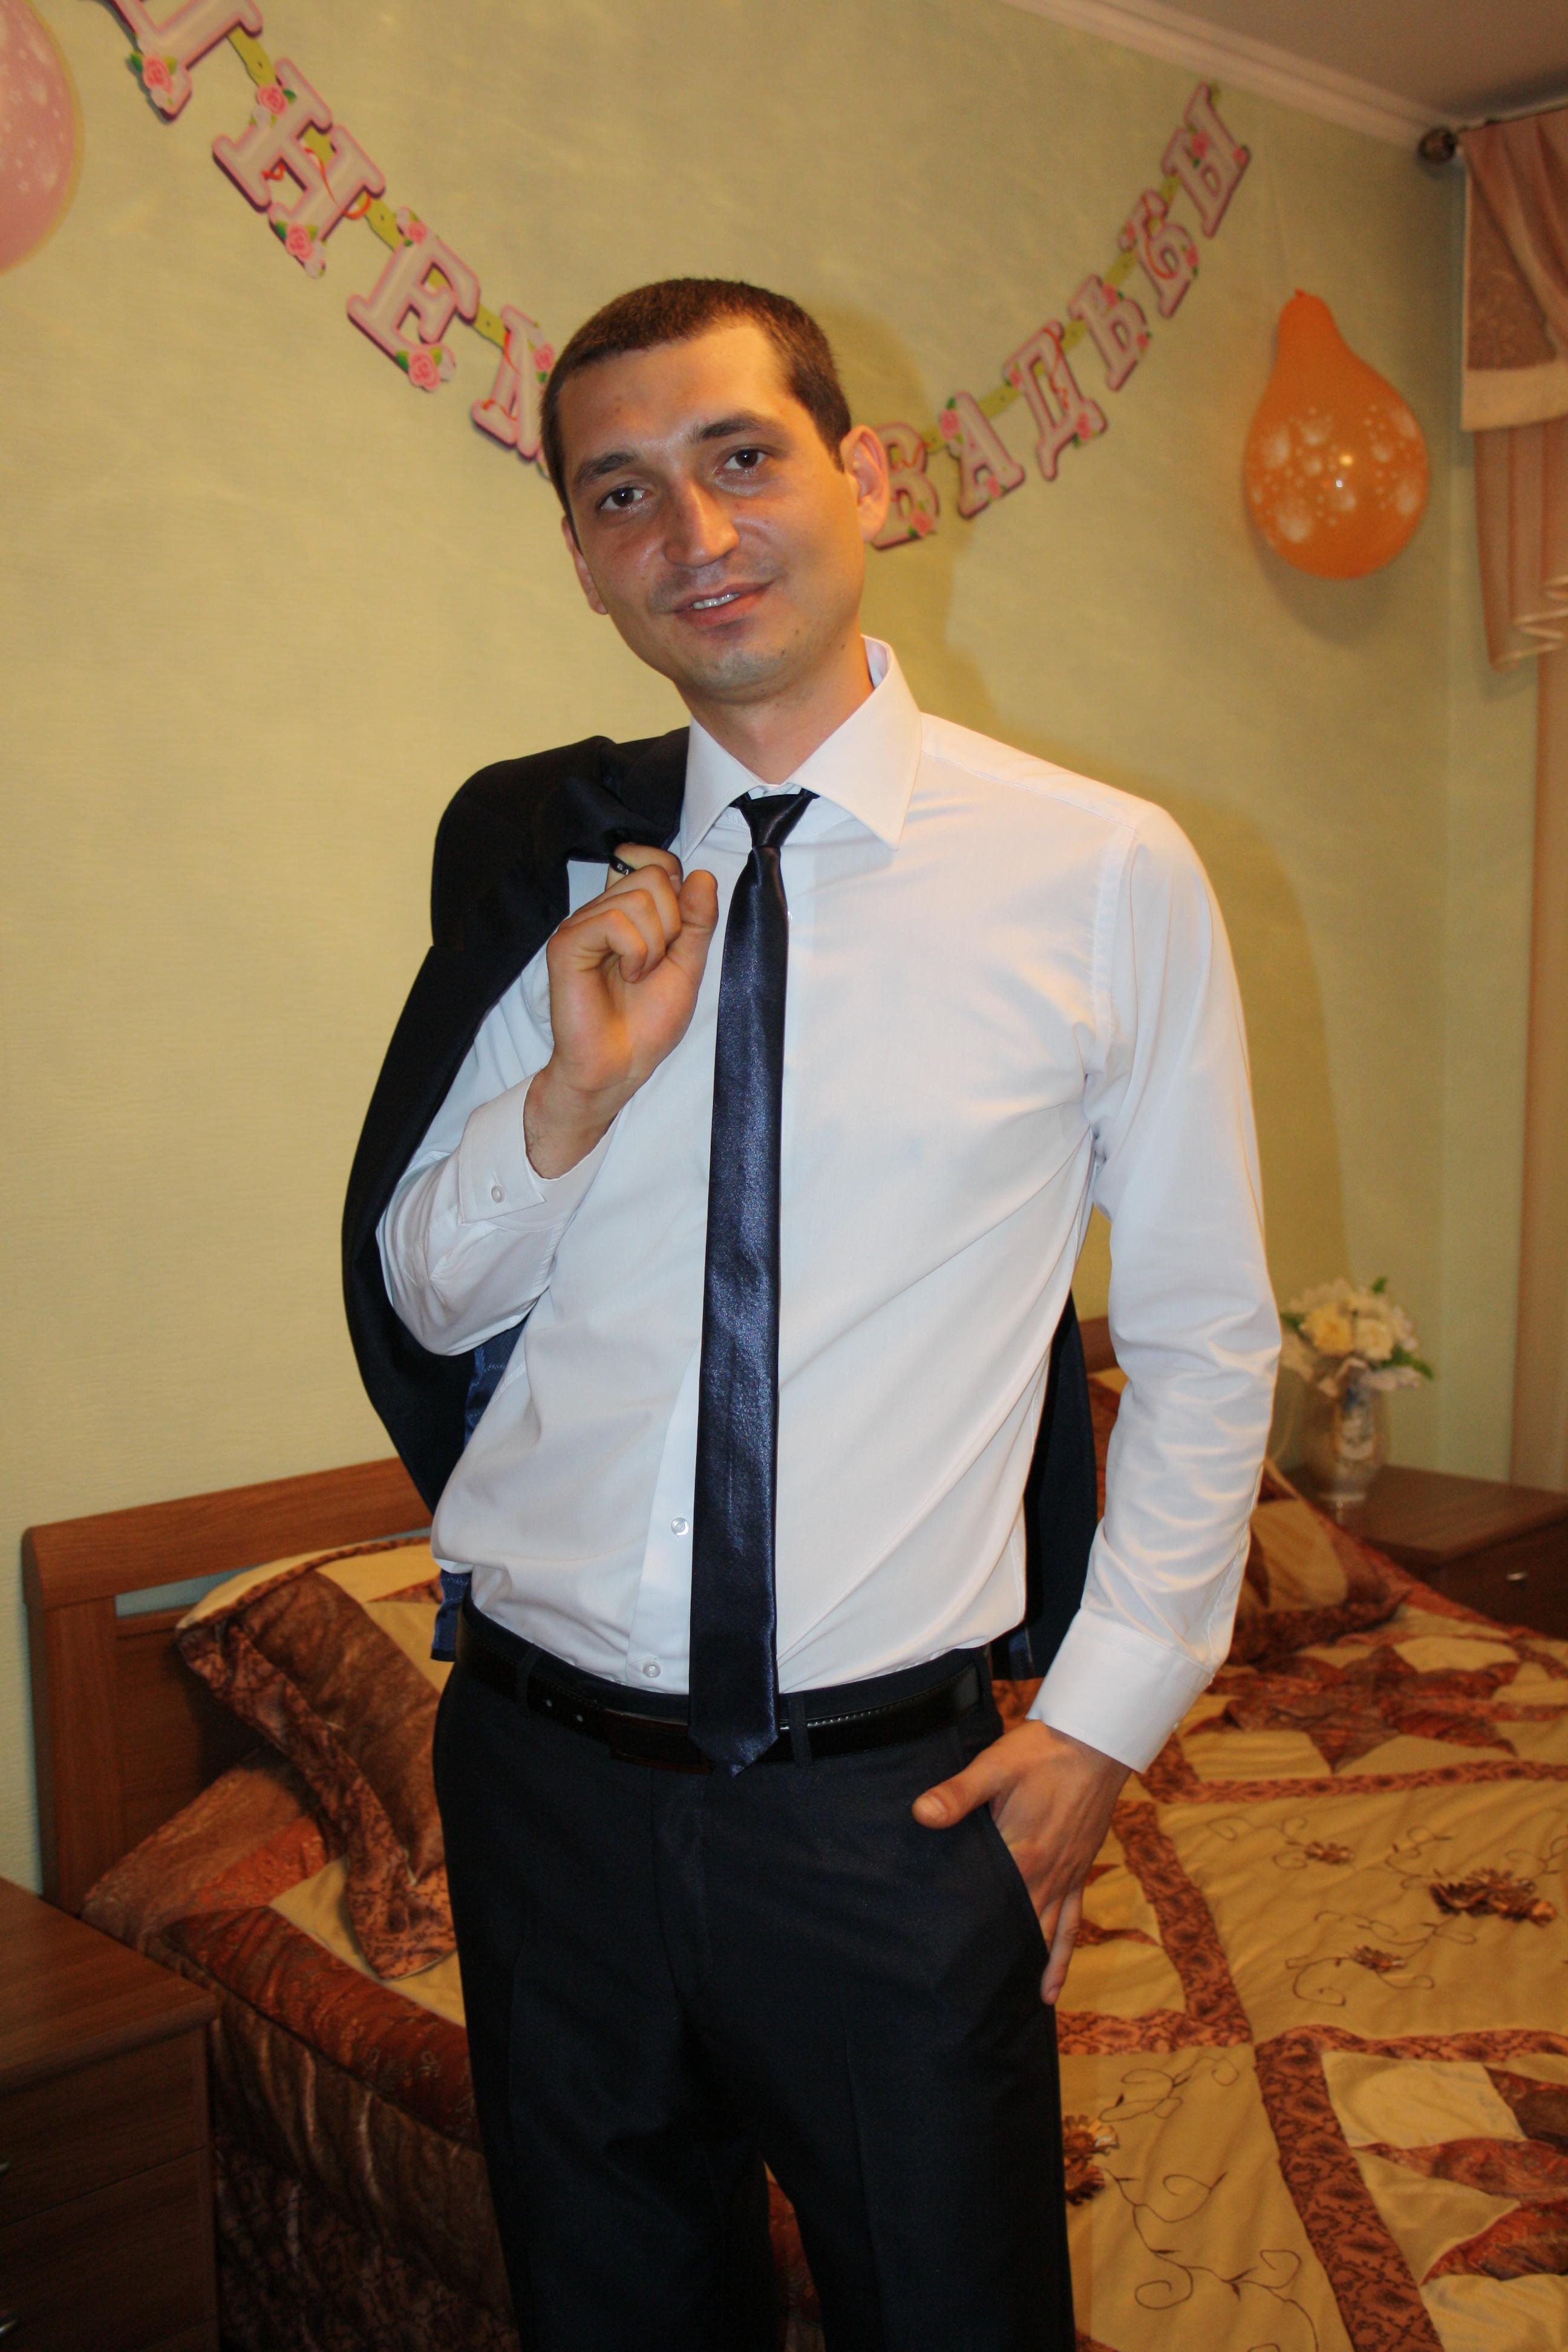 user1336, Димон, 33, Ставрополь